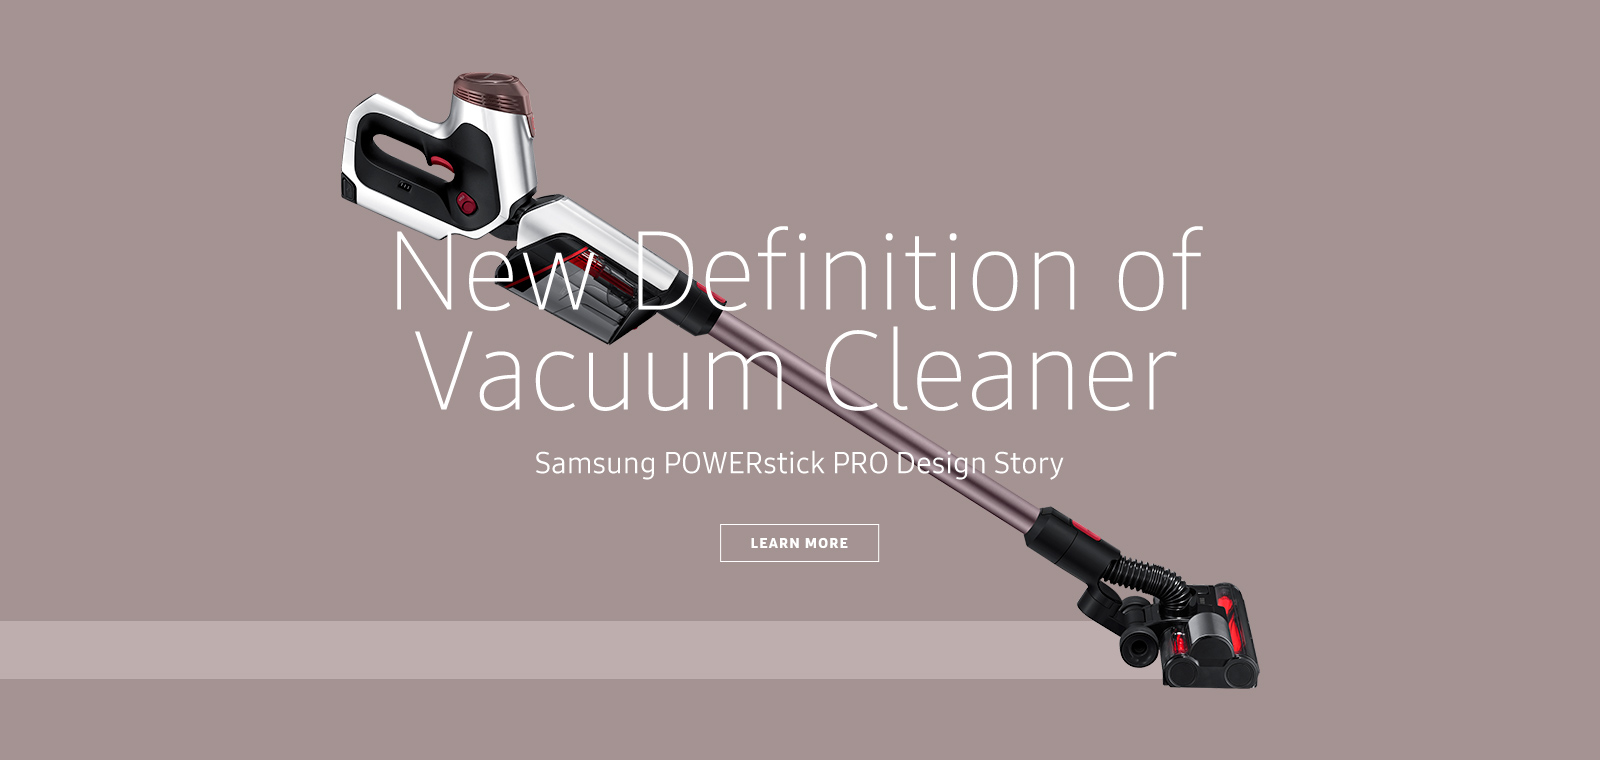 design samsung new definition of vacuum cleaner